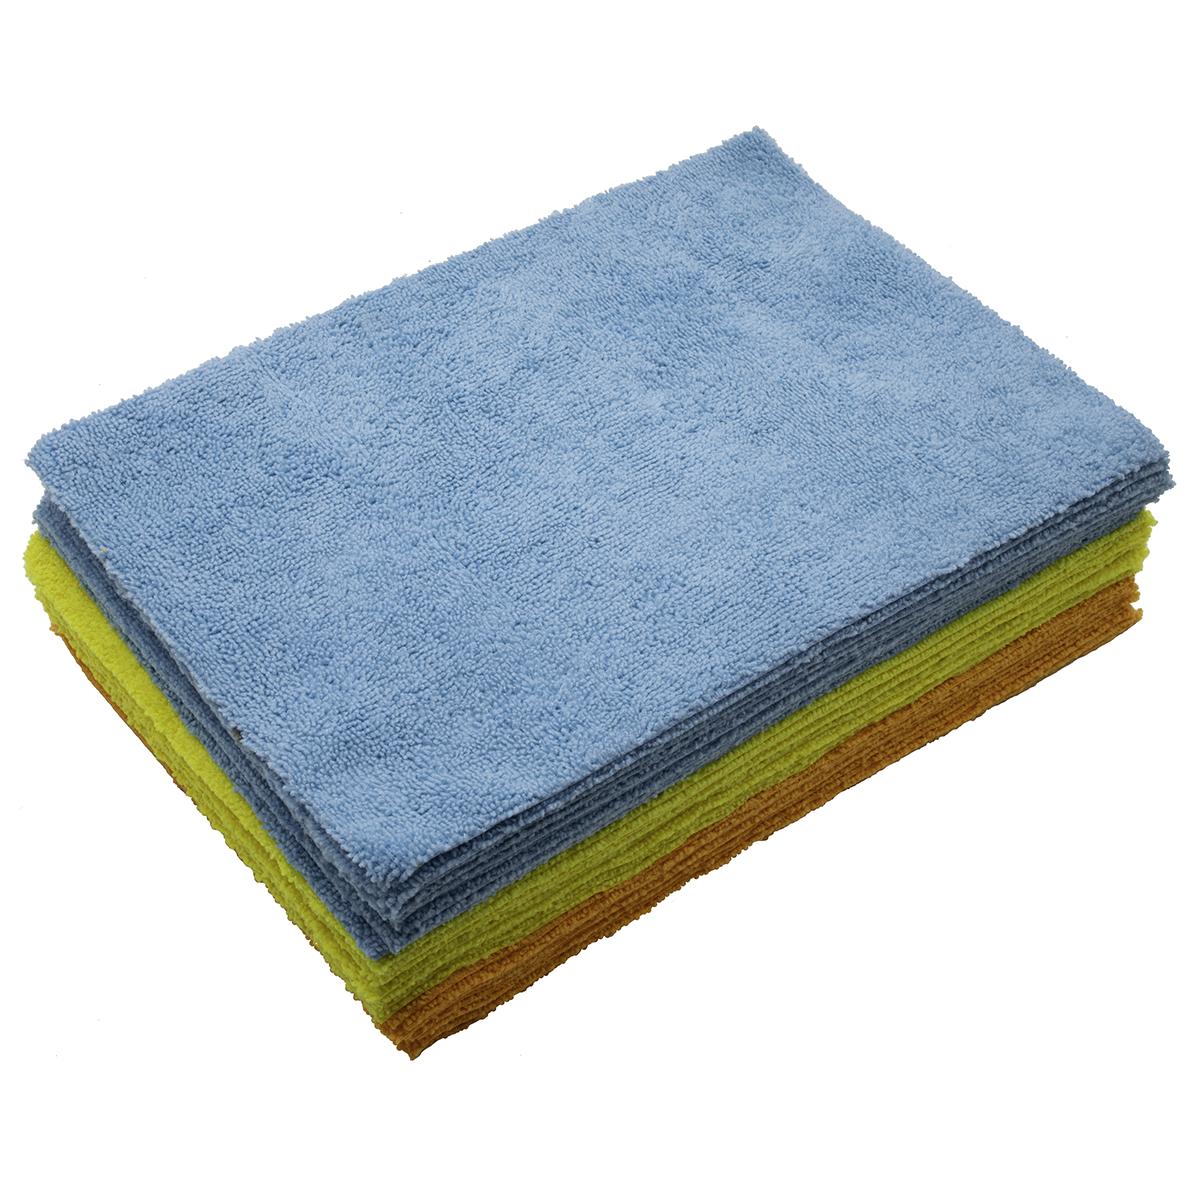 Microfiber Towels  30 pack